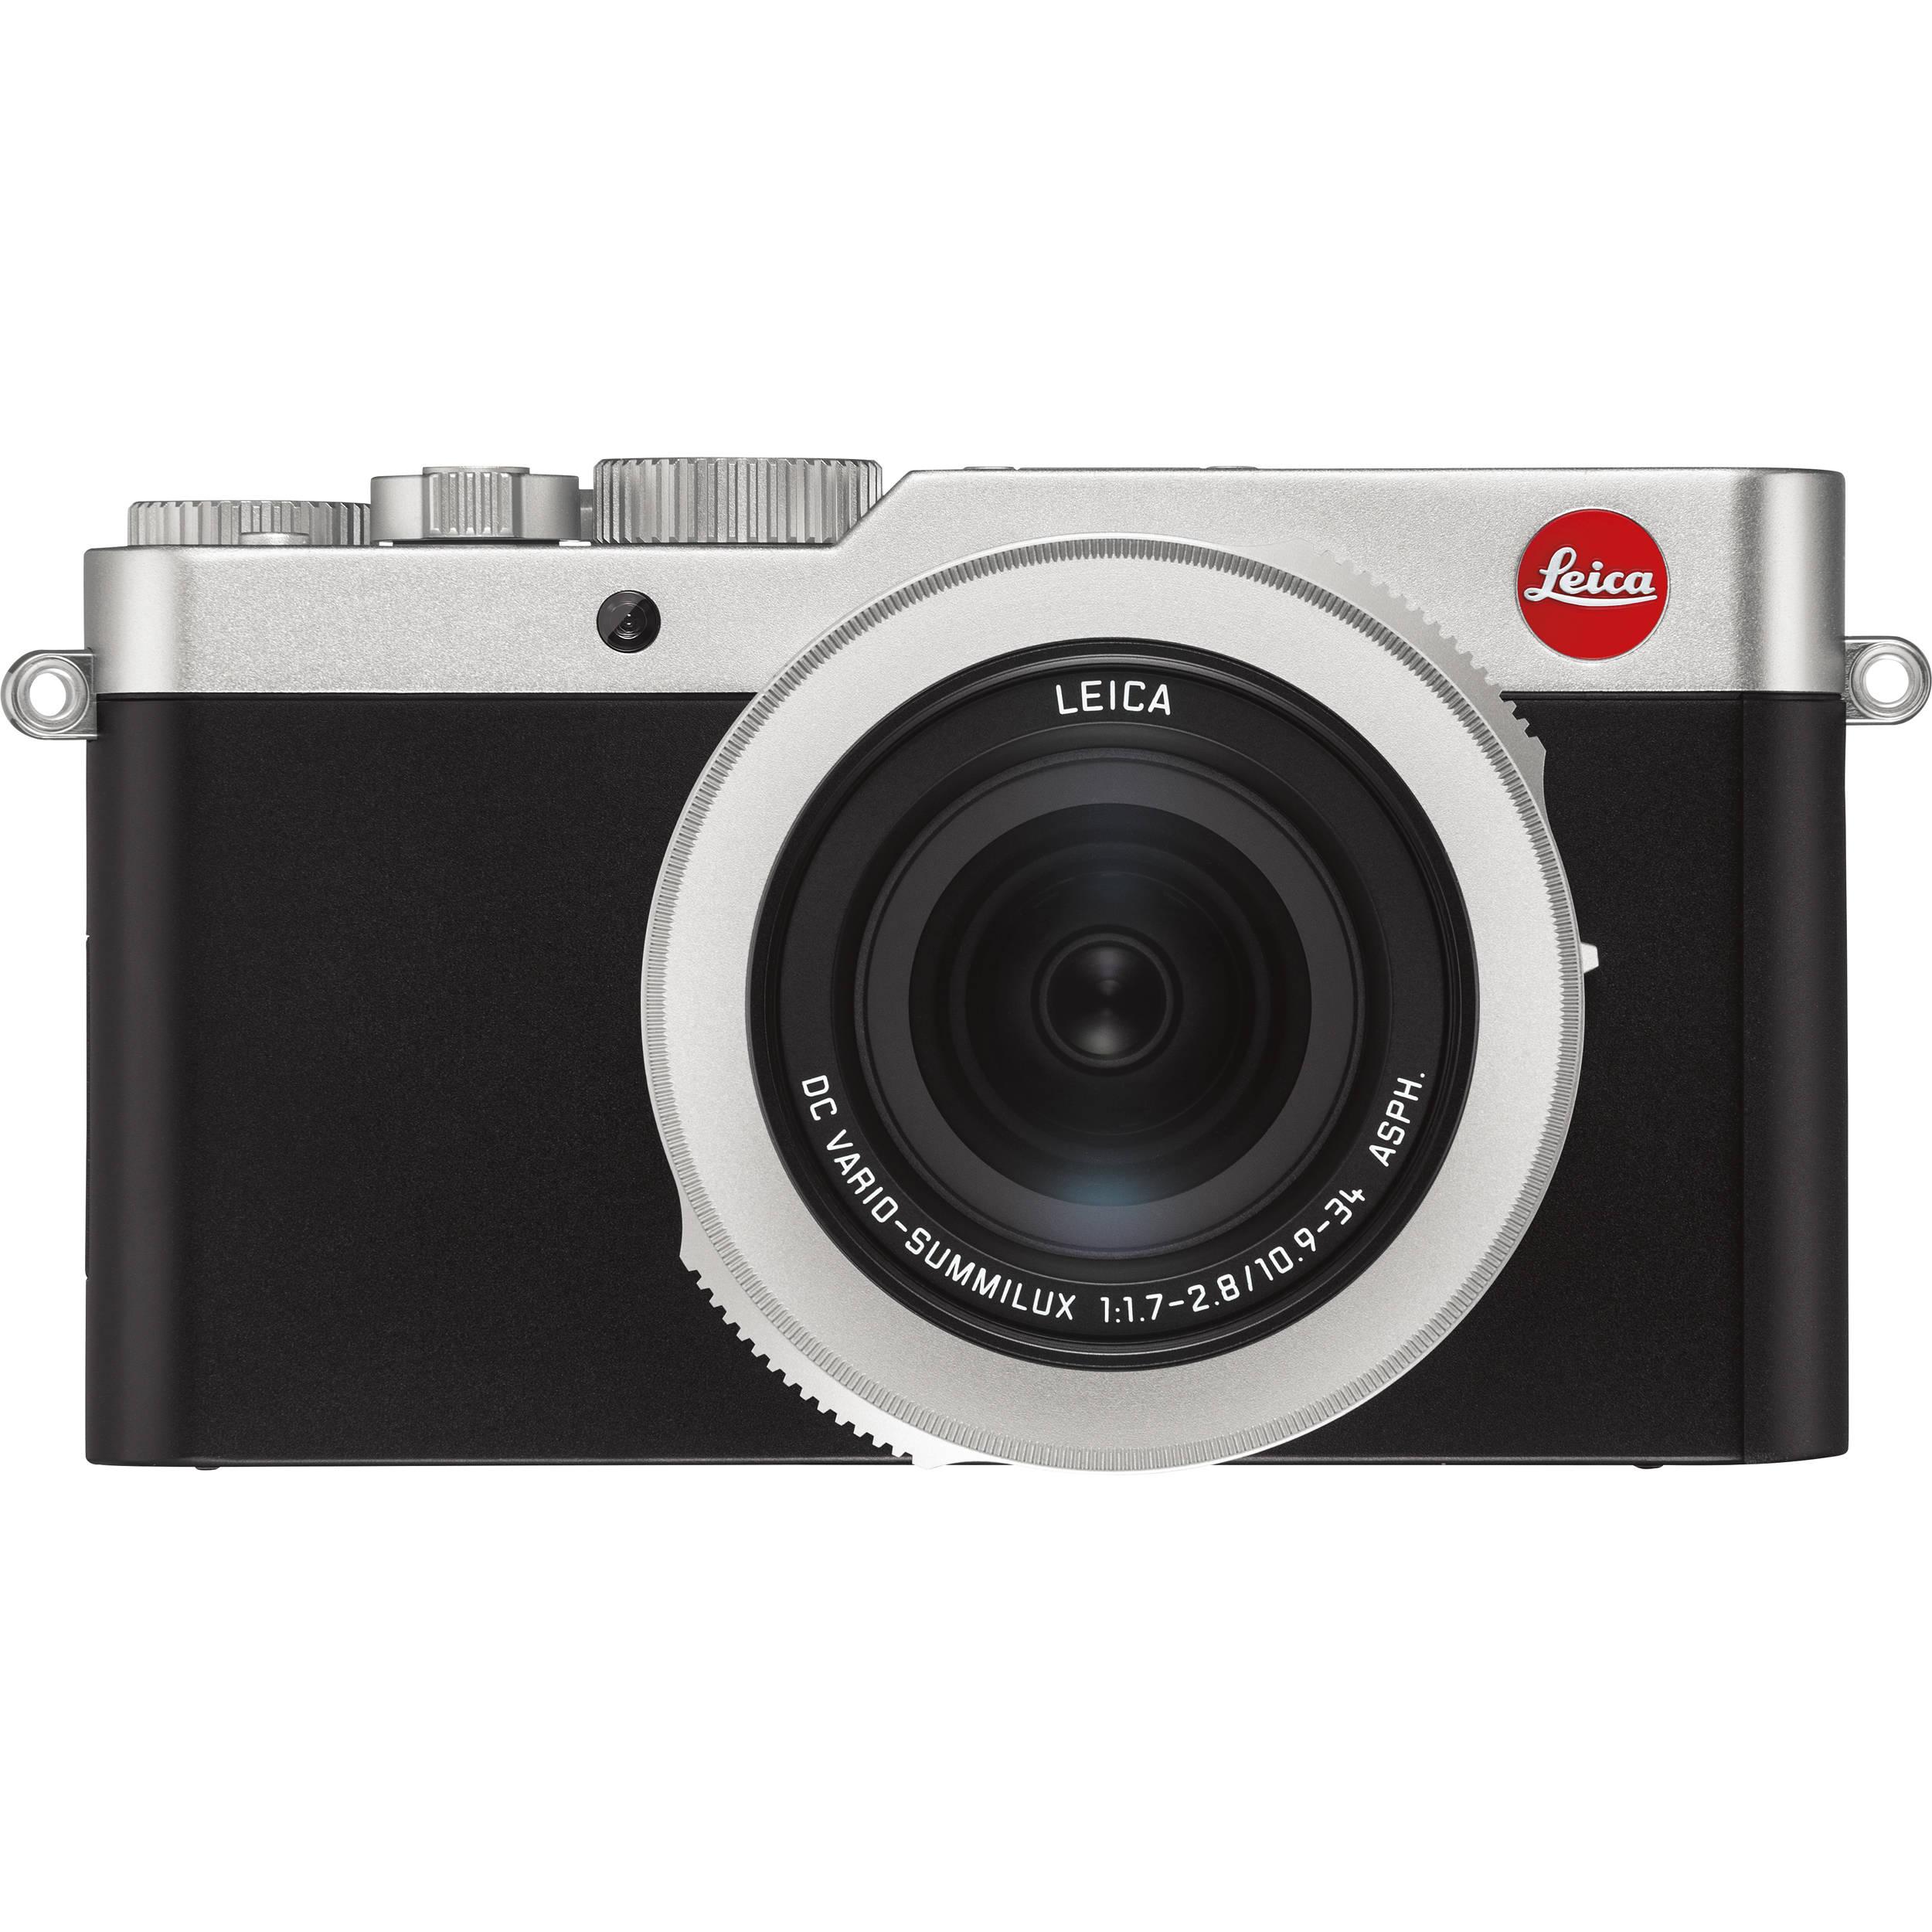 Leica D Lux 7 Digital Camera Silver 19116 B H Photo Video